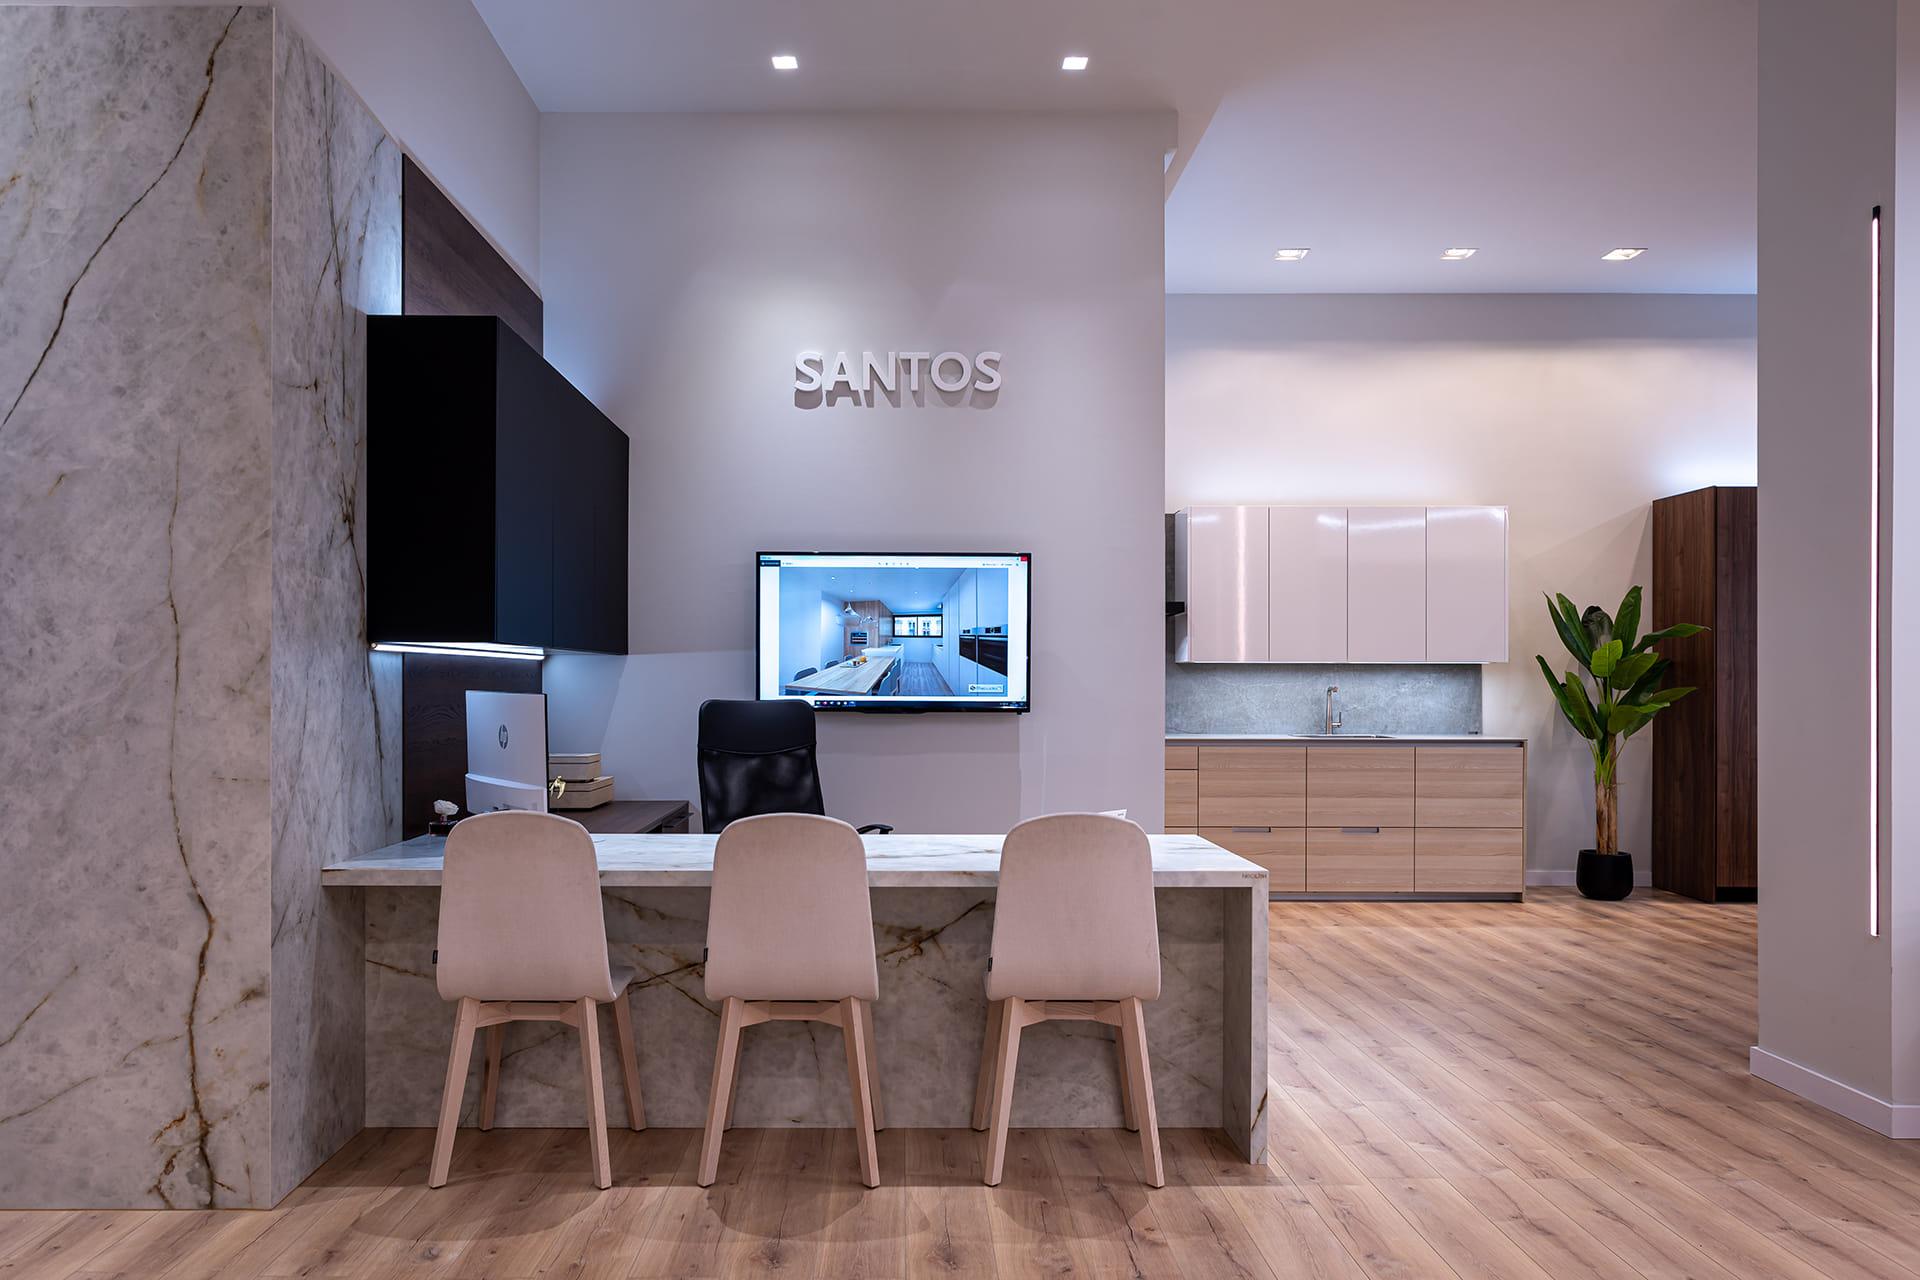 Santos Estudio 7 kitchen showroom in Granada